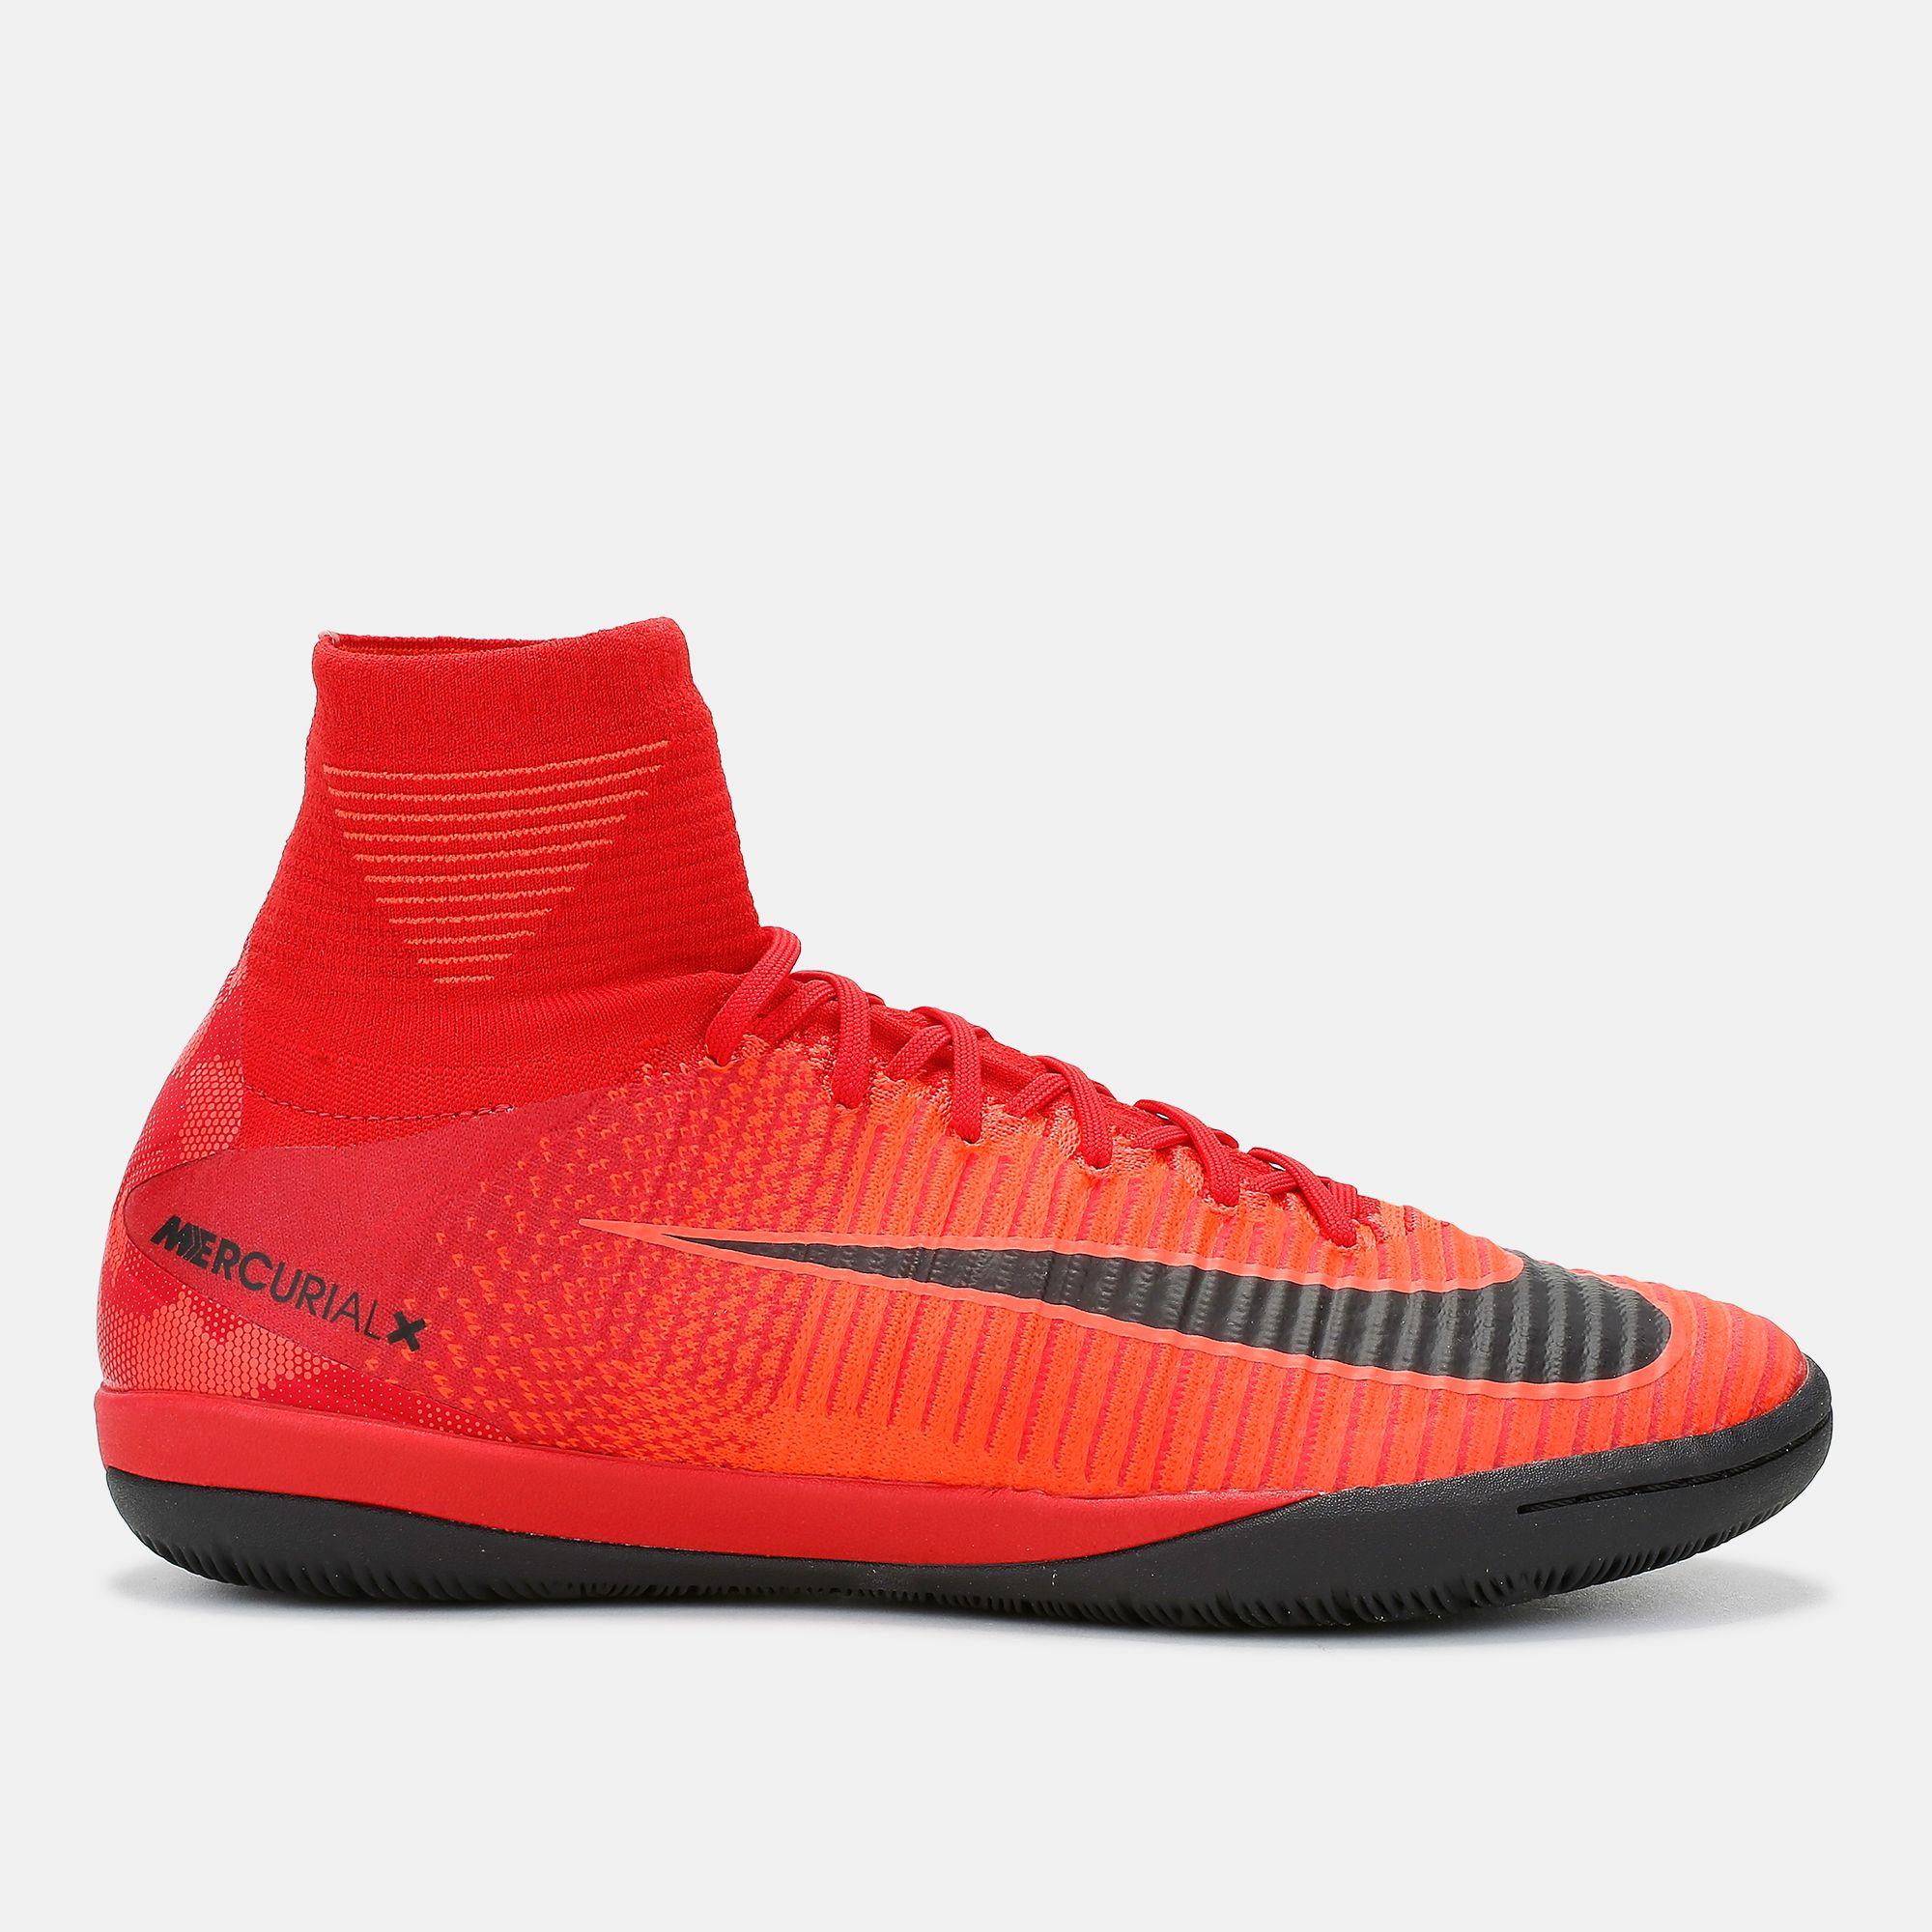 ff076850aeb8 greece nike mercurialx proximo ii indoor court shoe 980a2 a6faa